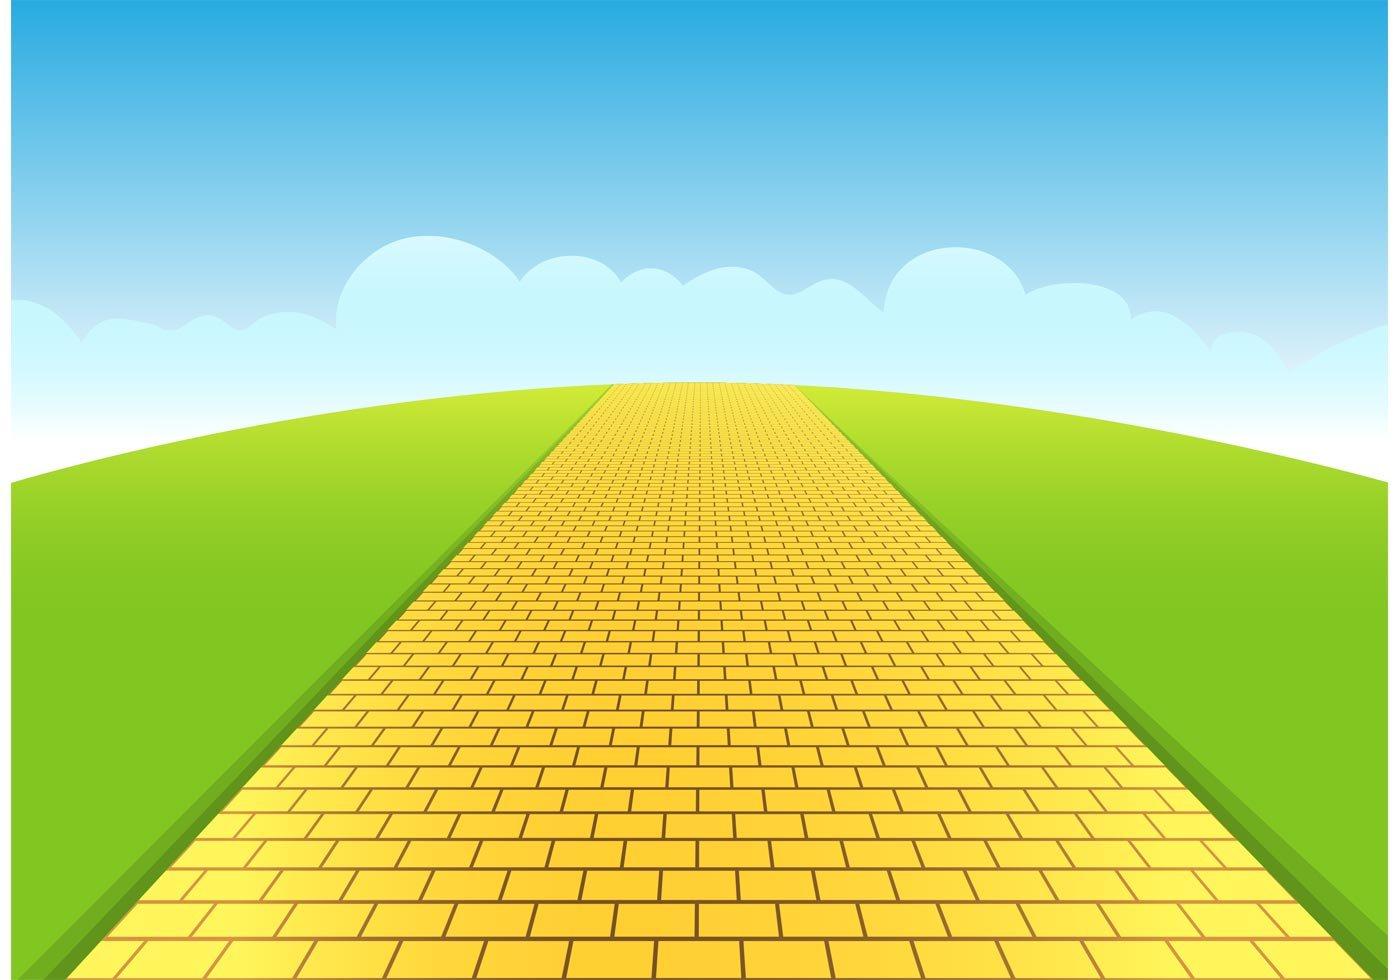 Yellow brick road clipart free » Clipart Portal.